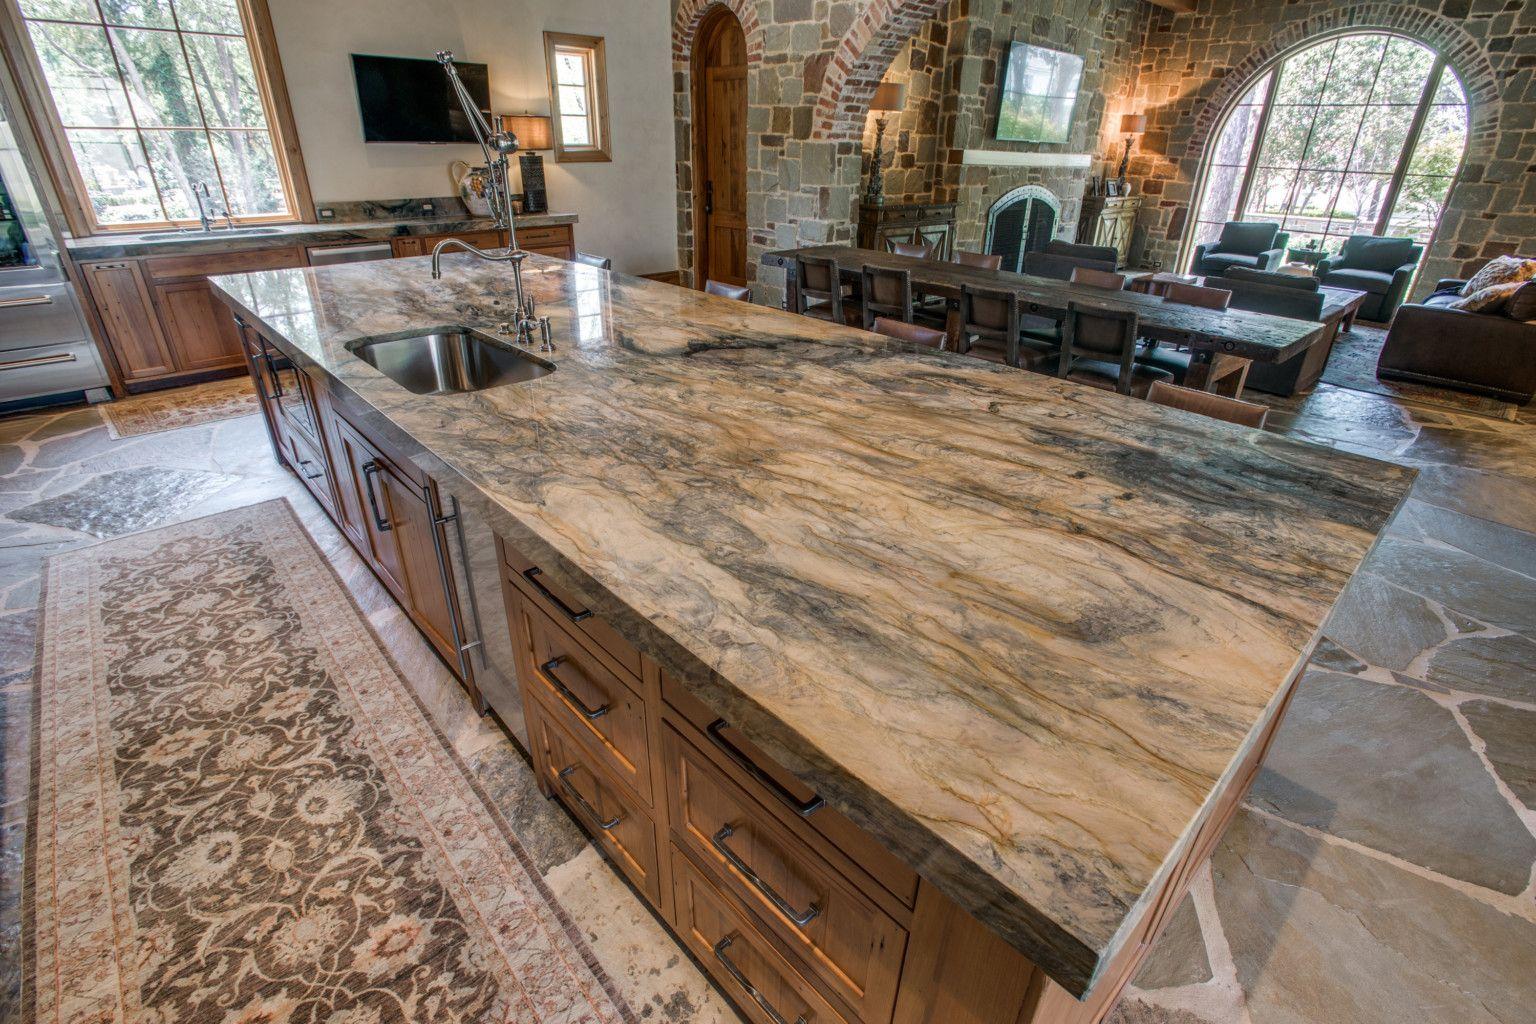 Fusion Quartzite Kitchen Aria Stone Gallery Natural Stone Kitchen Stone Gallery Kitchen Styling